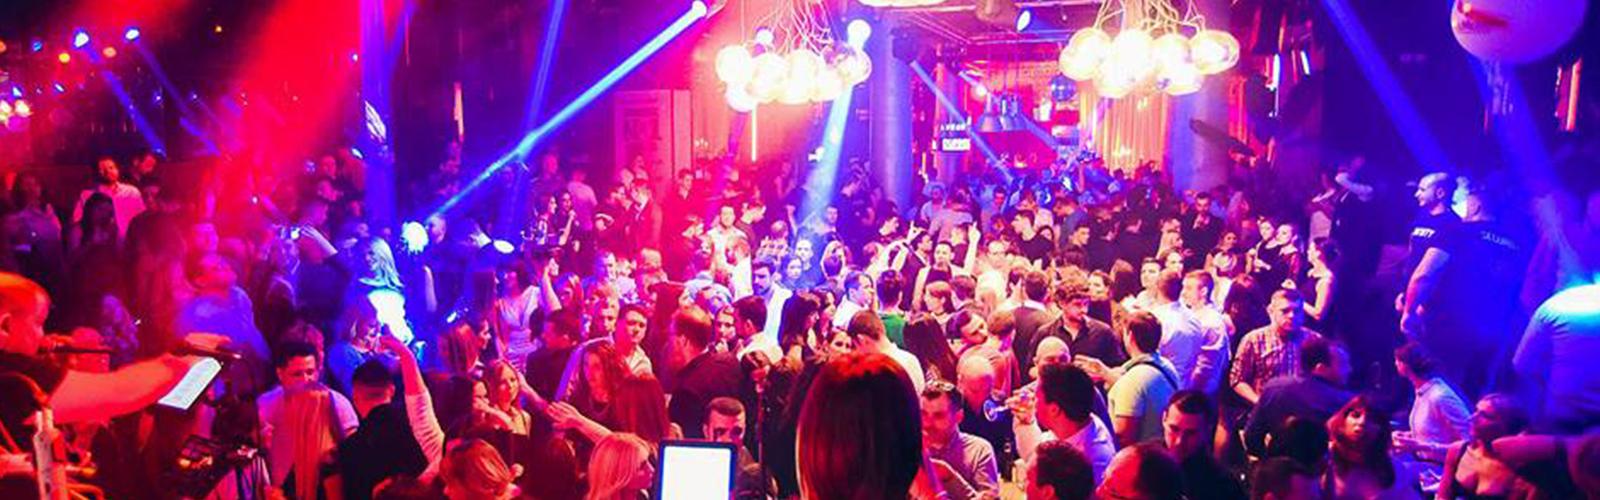 Concierge Belgrade | Klub Kasina